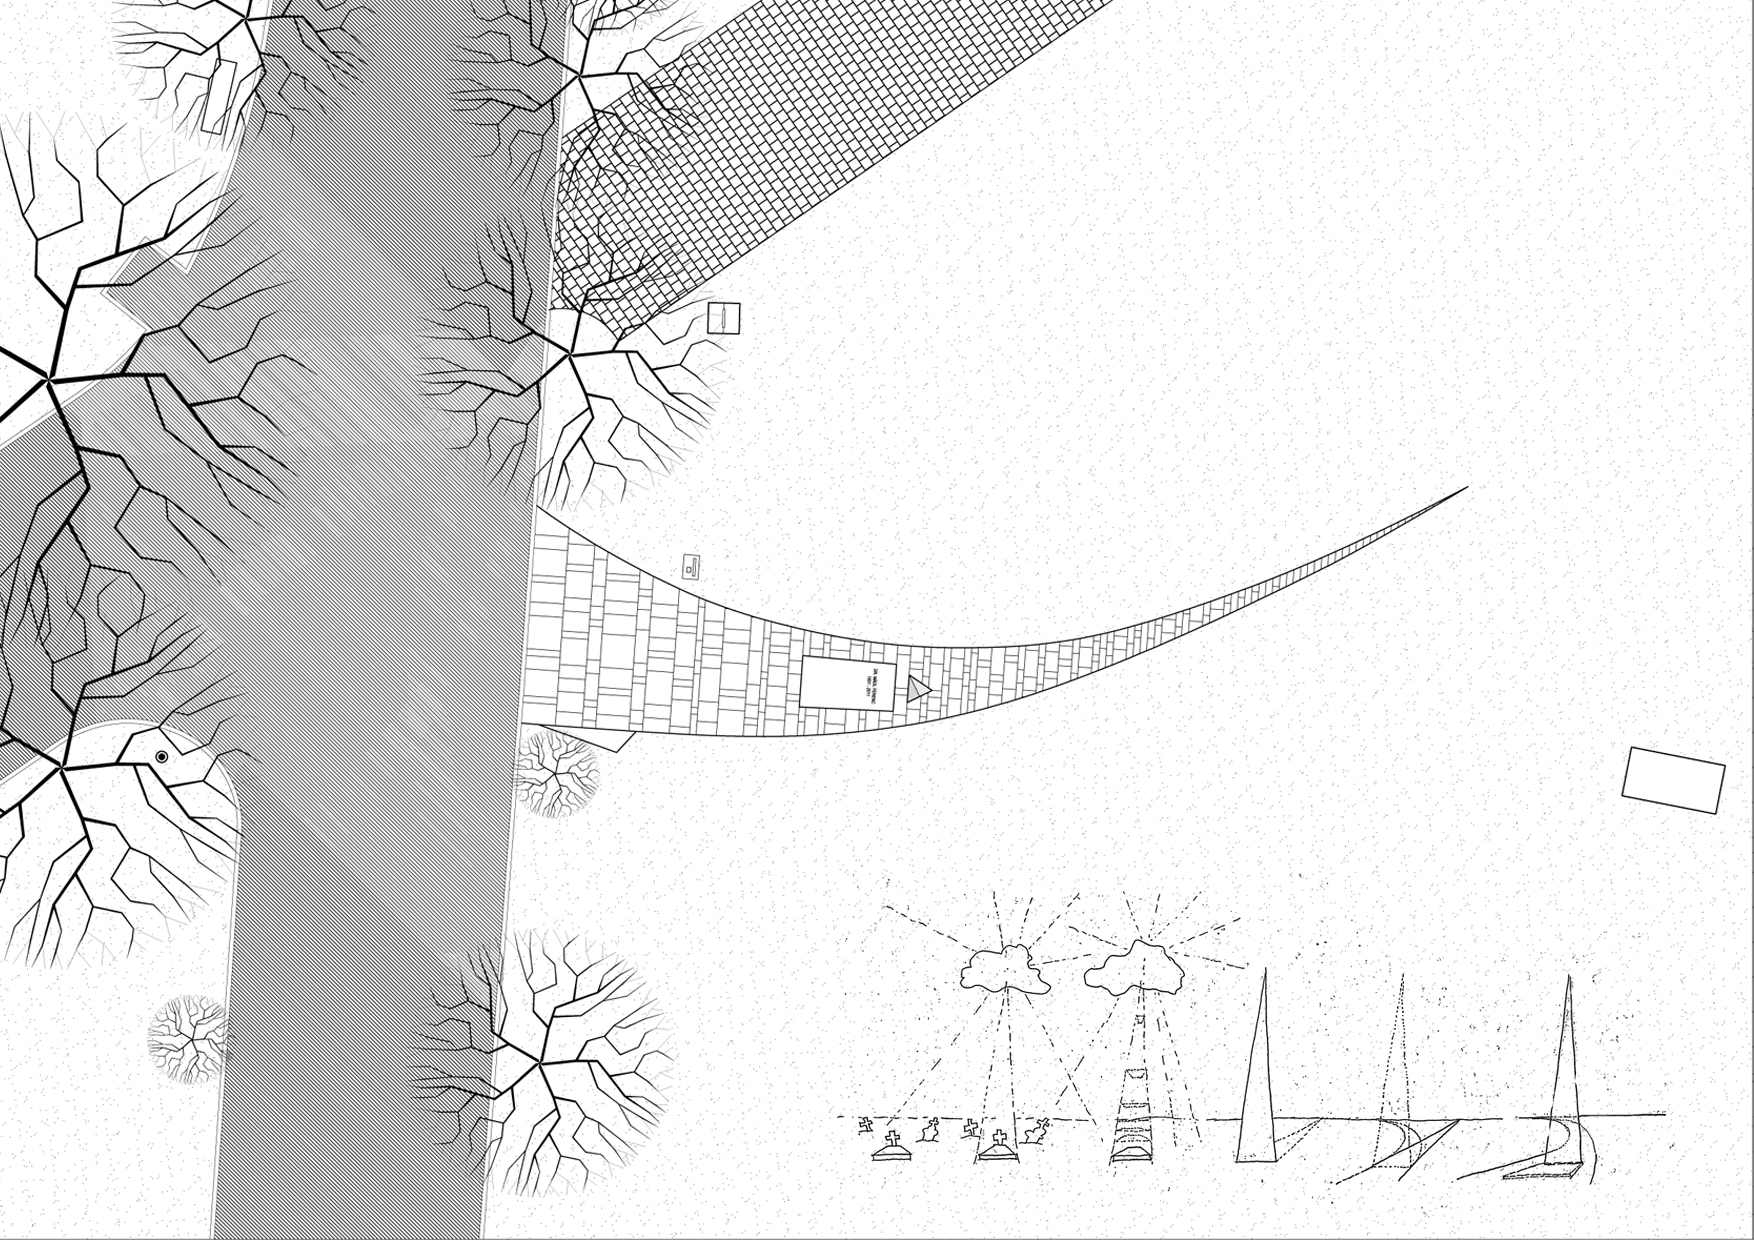 Balazs ALMASI DLA, PhD - Landscape Architect